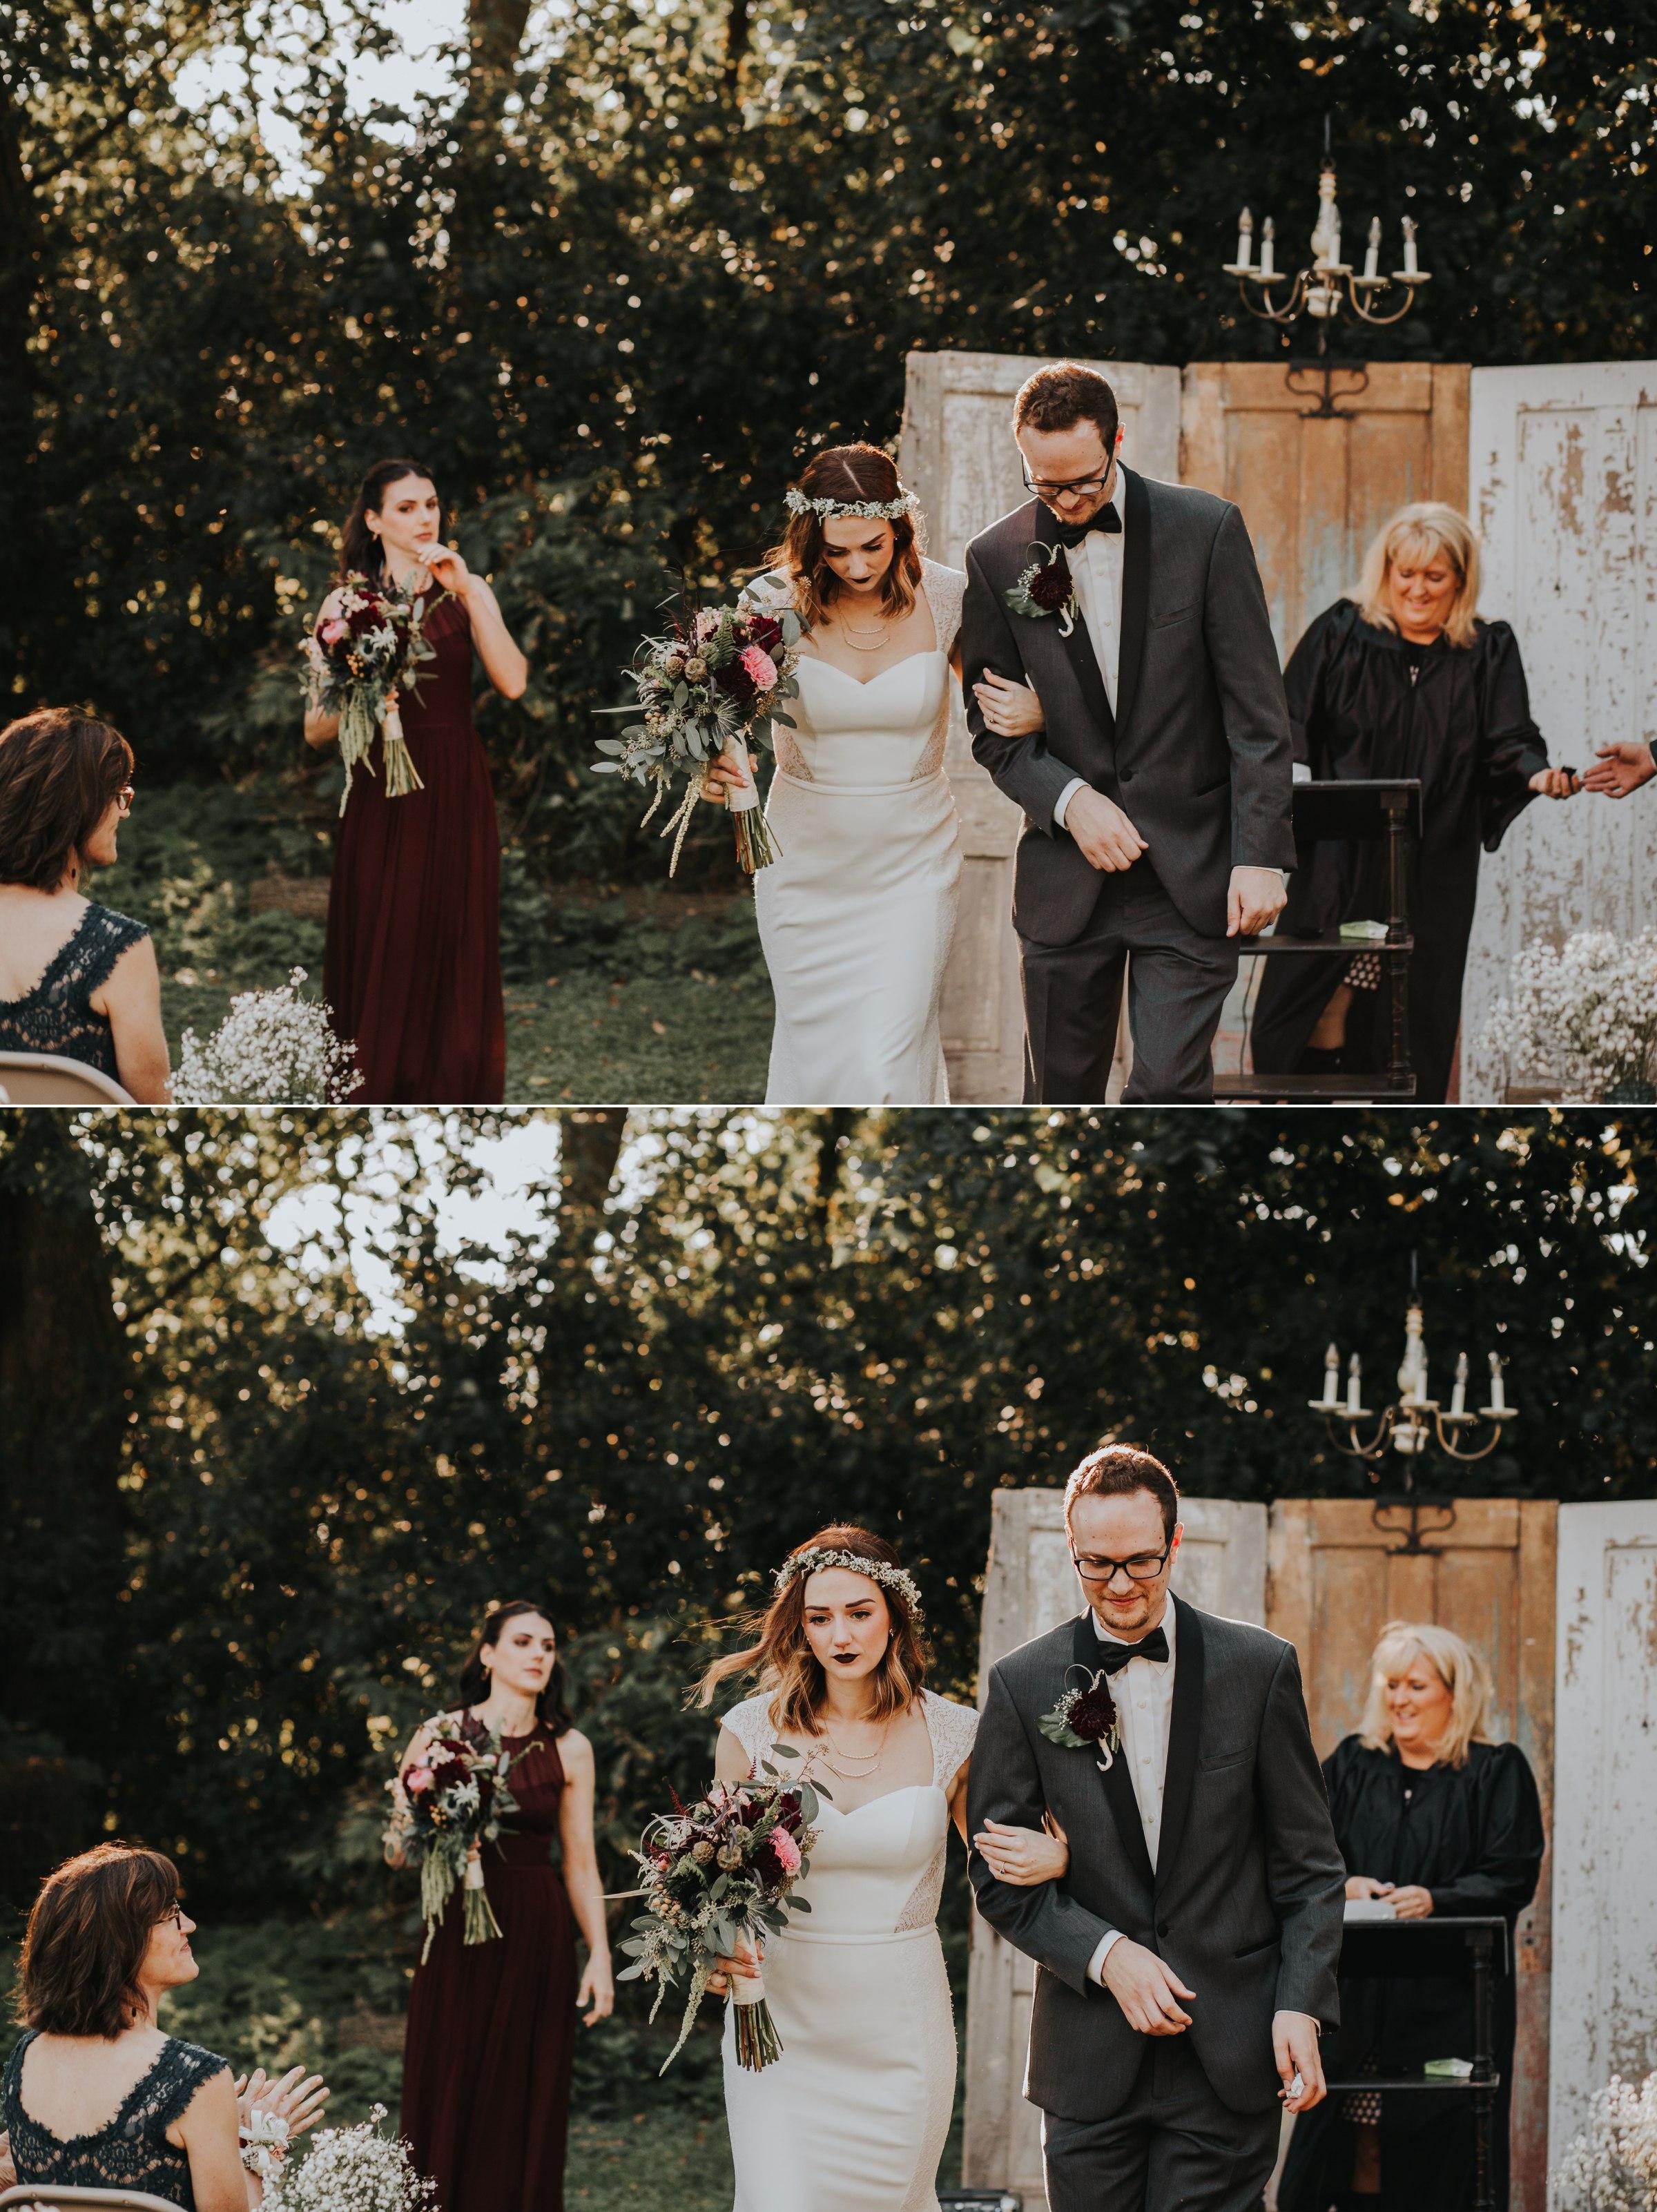 caroline and taylor minneapolis minnesota texas austin dallas houston wedding elopement destination intimate adventurous couple best photographer_0243.jpg